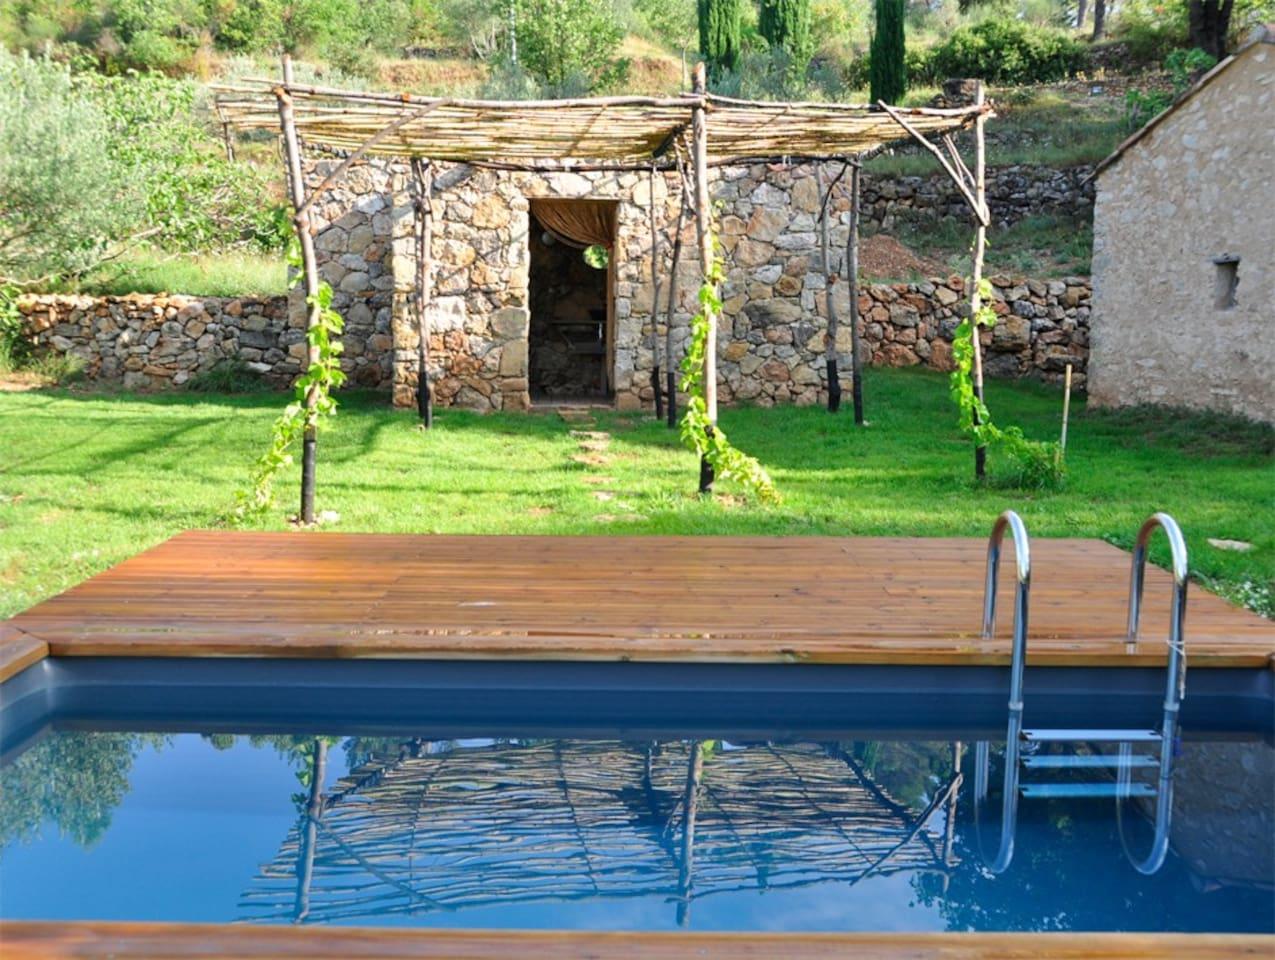 Piscine, terrasse et tonnelle